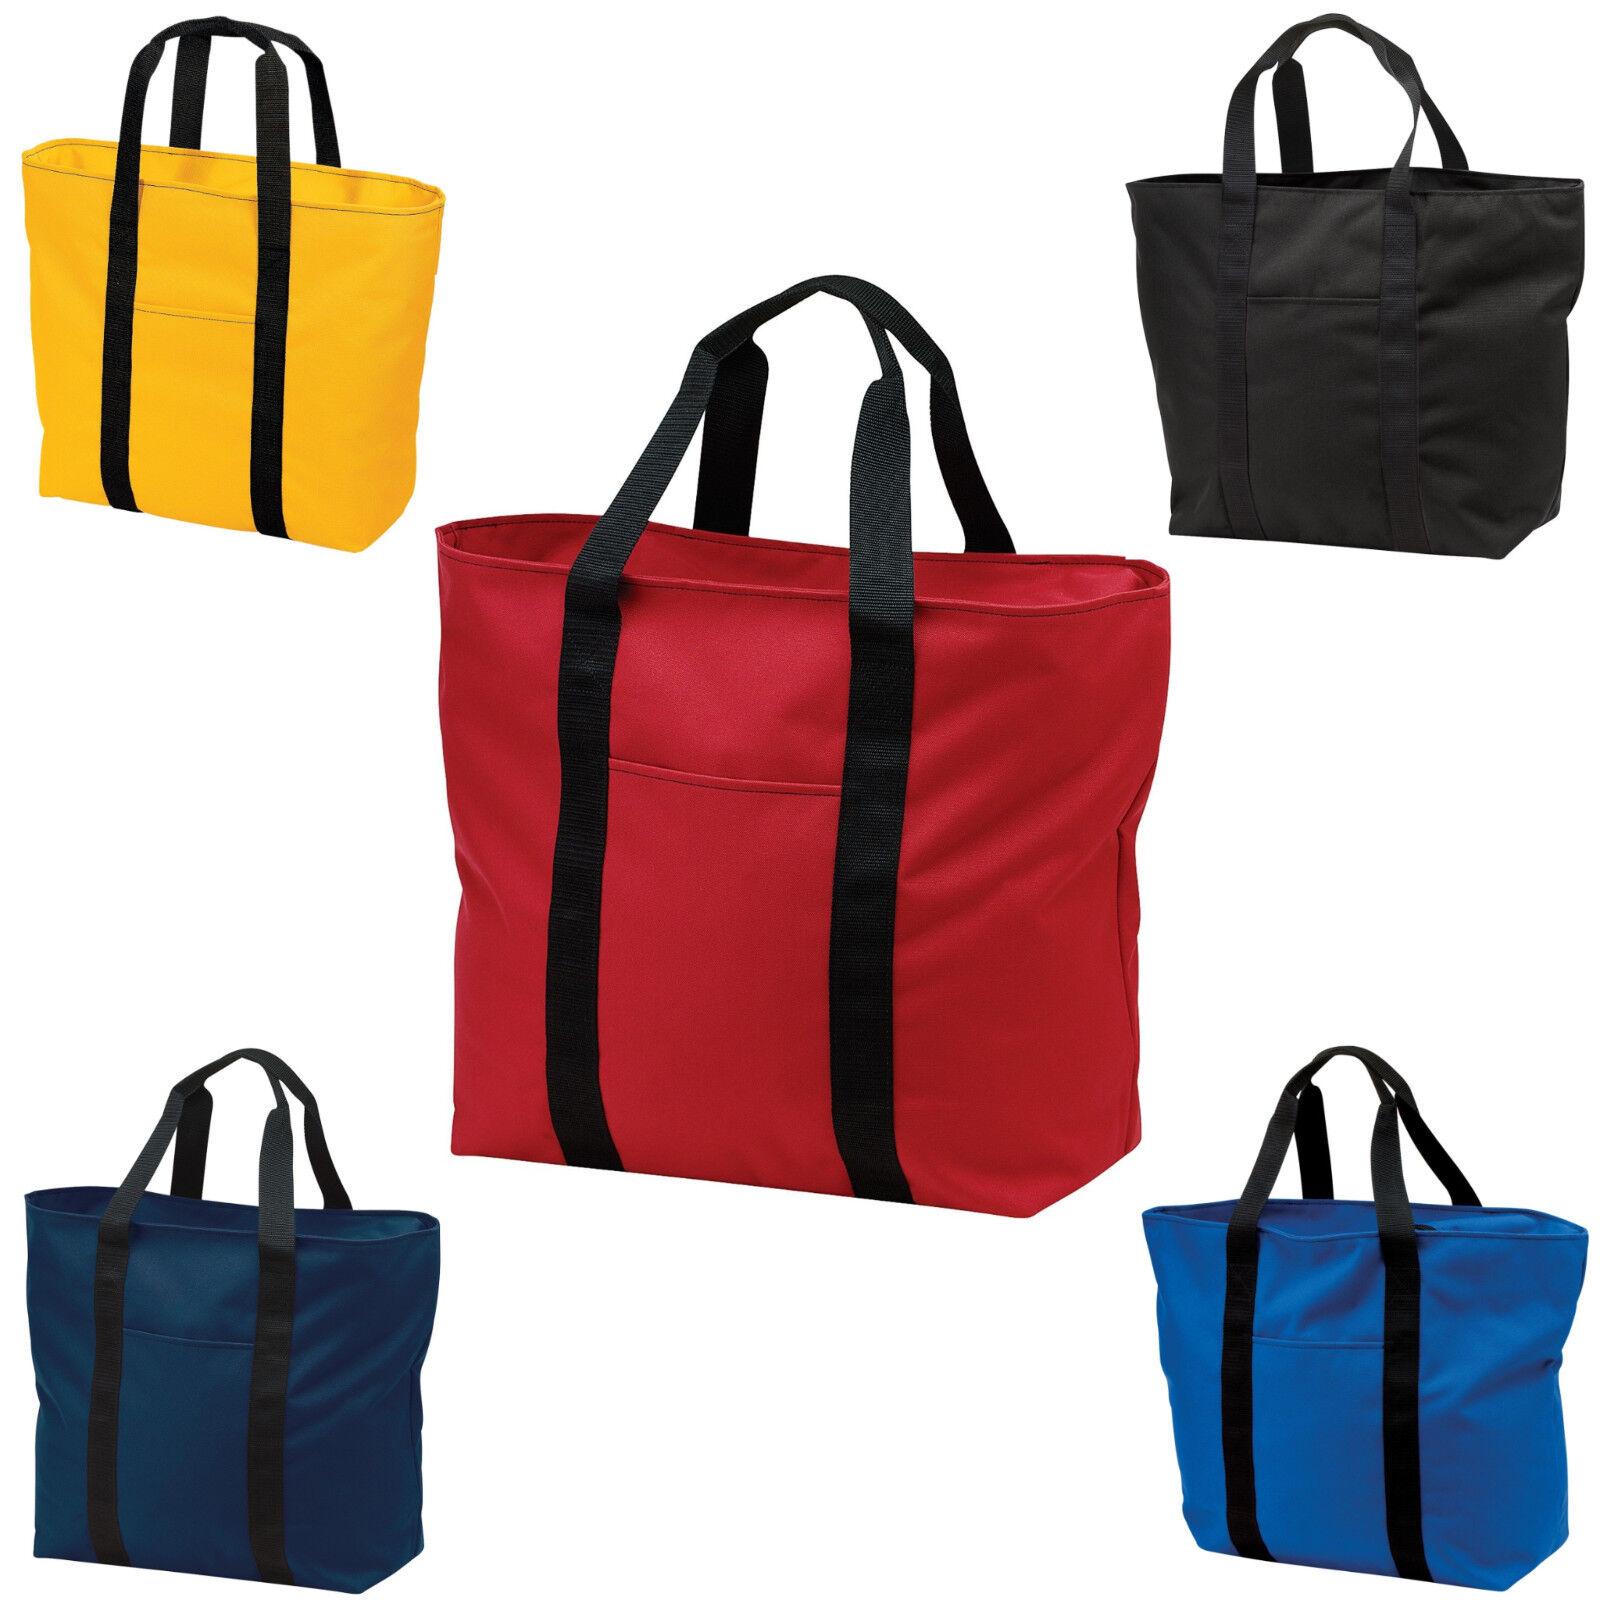 Extra Large Zippered Tote Bag Beach Bag All Purpose Tote Cra